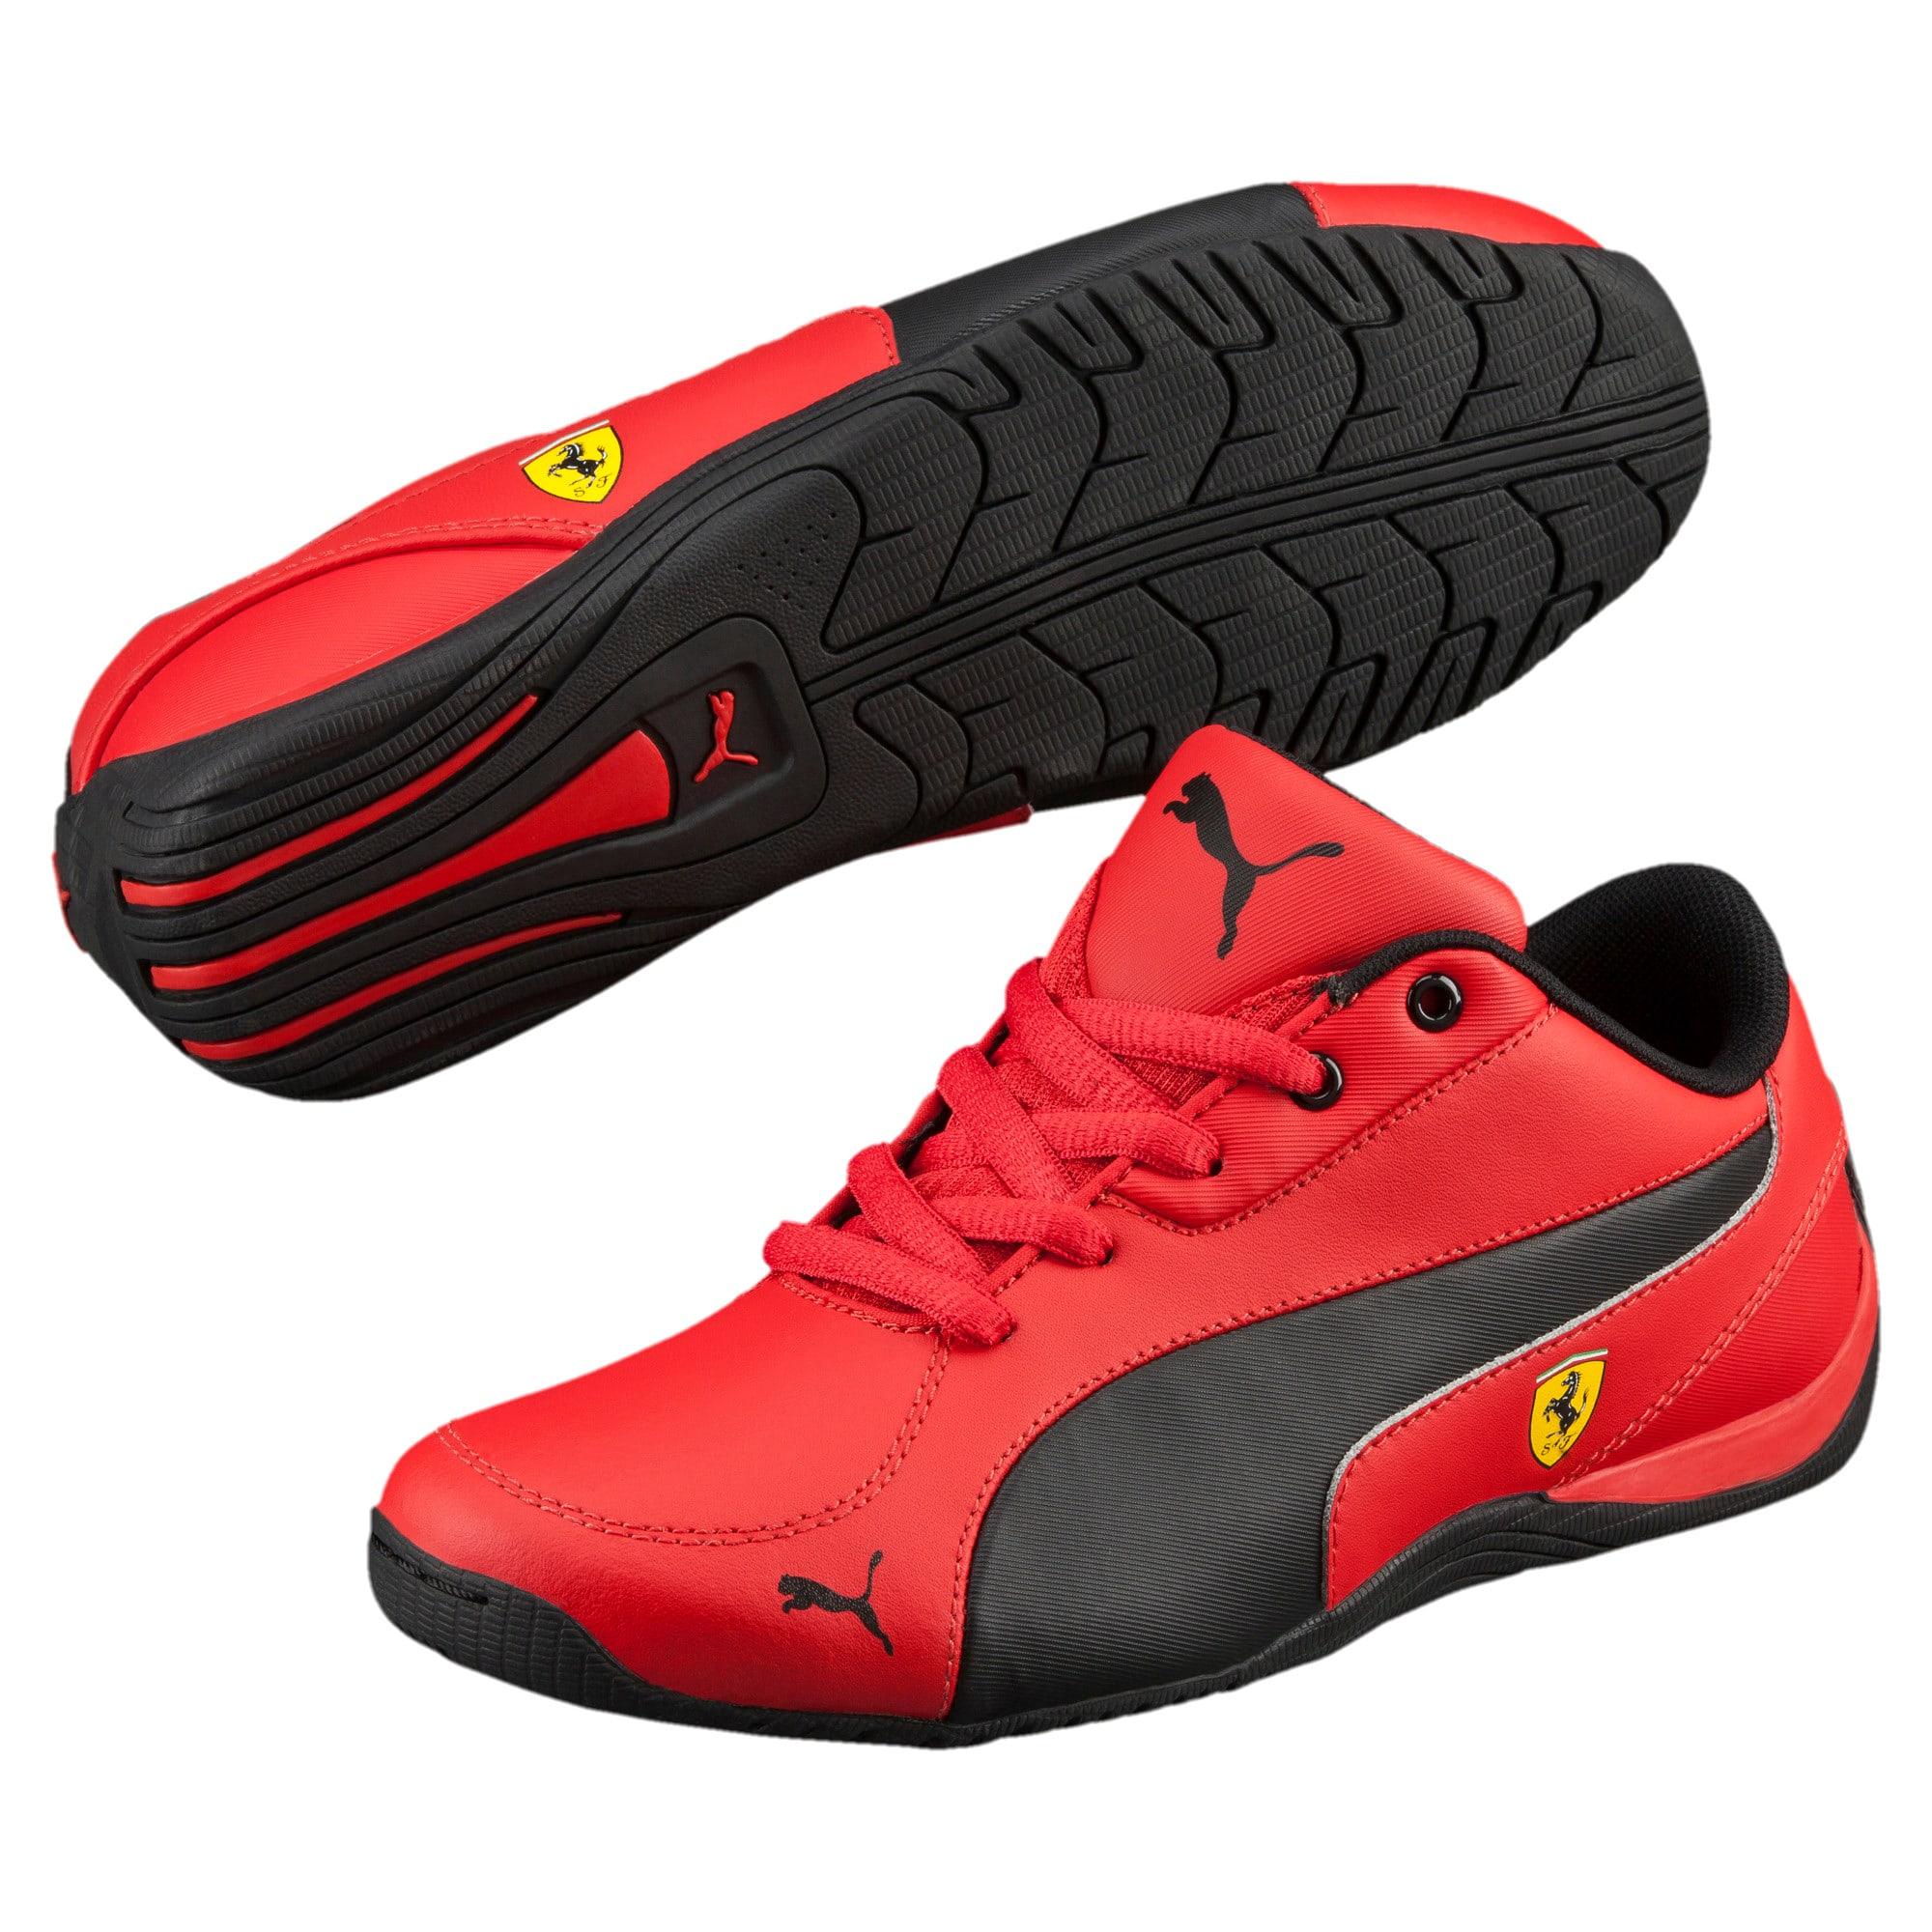 Thumbnail 2 of Ferrari Drift Cat 5 Jr. Trainers, Rosso Corsa-Puma Black, medium-IND